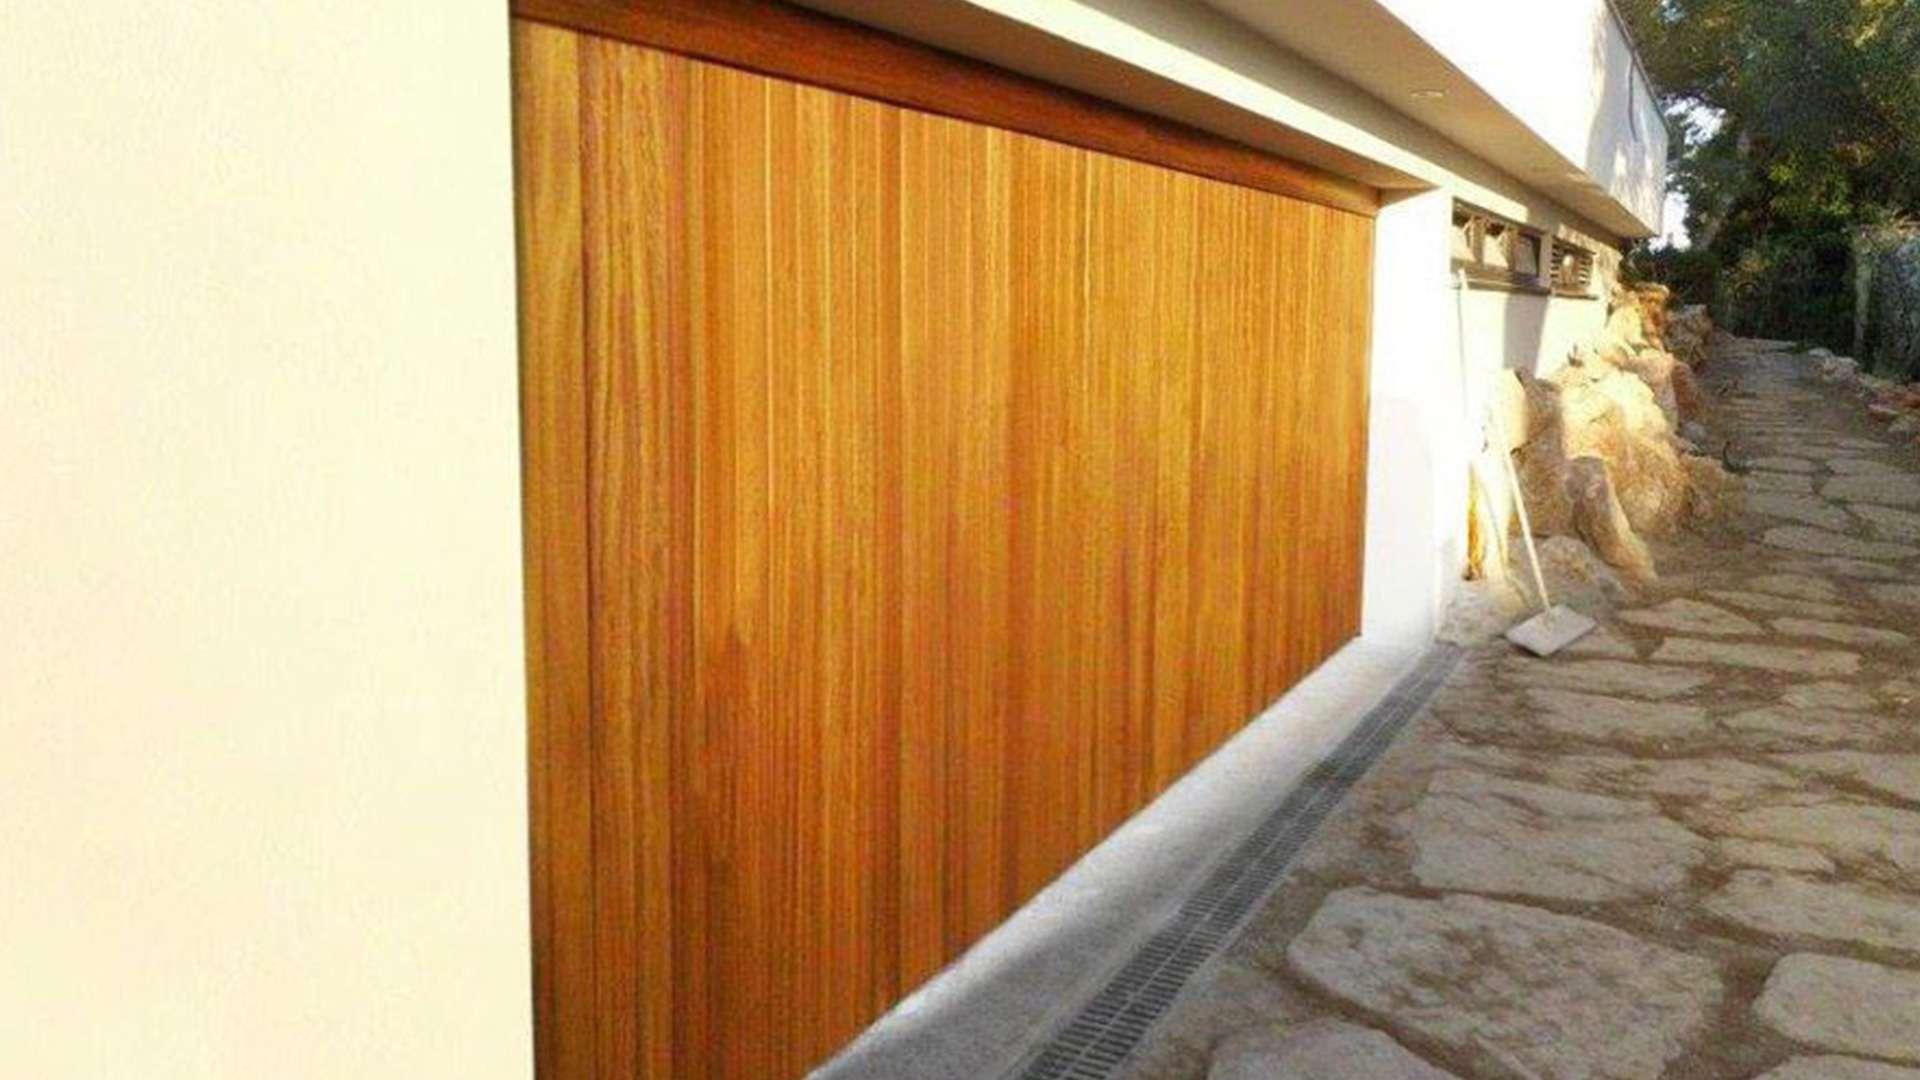 Garagentor aus Holz in heller Fassade